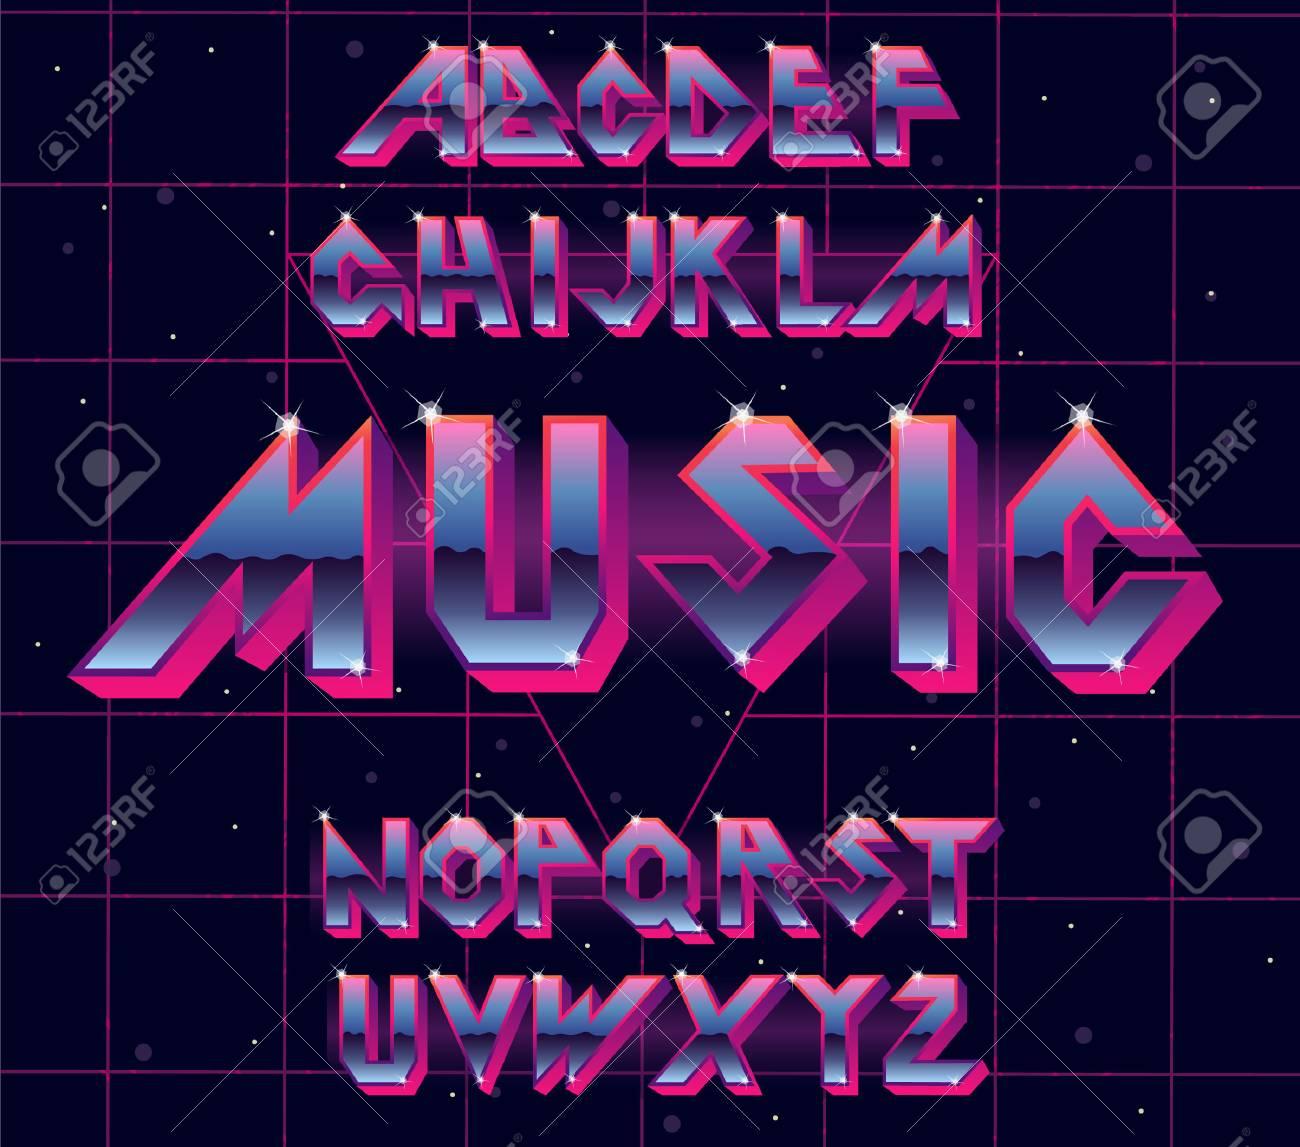 80 s retro alphabet font  Vector typography for flyers, headlines,